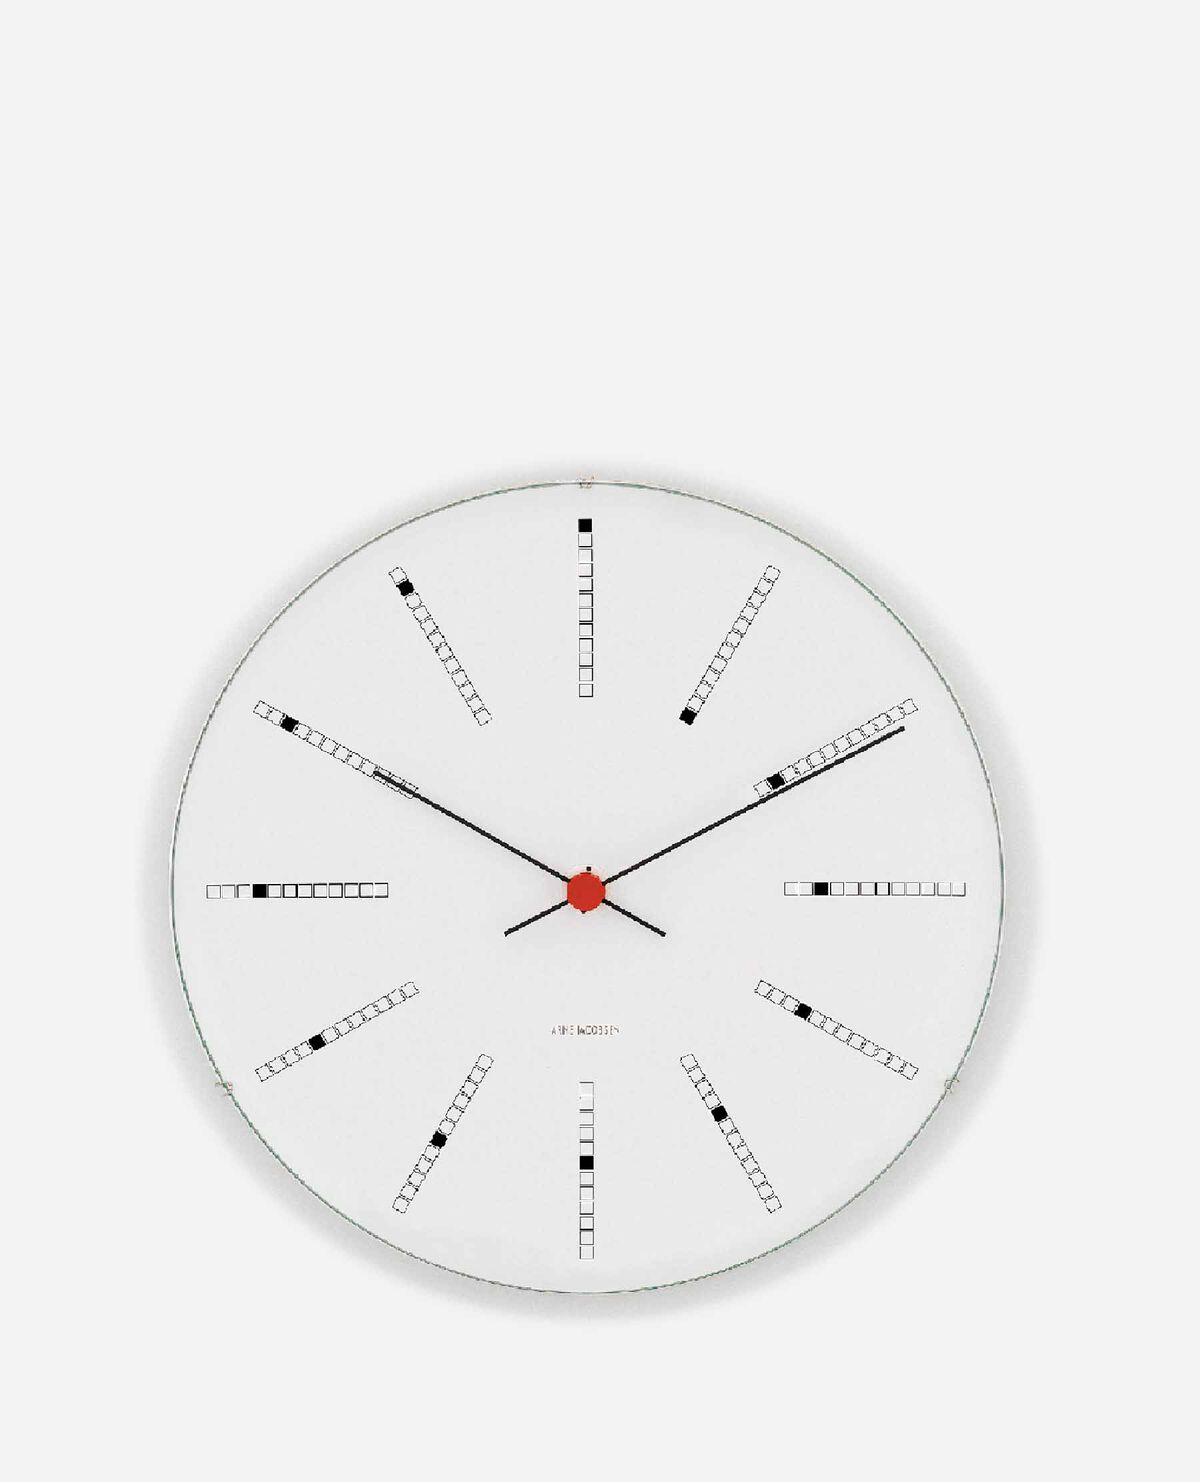 Wall Clock Bankers(ウォールクロック バンカーズ)290mm